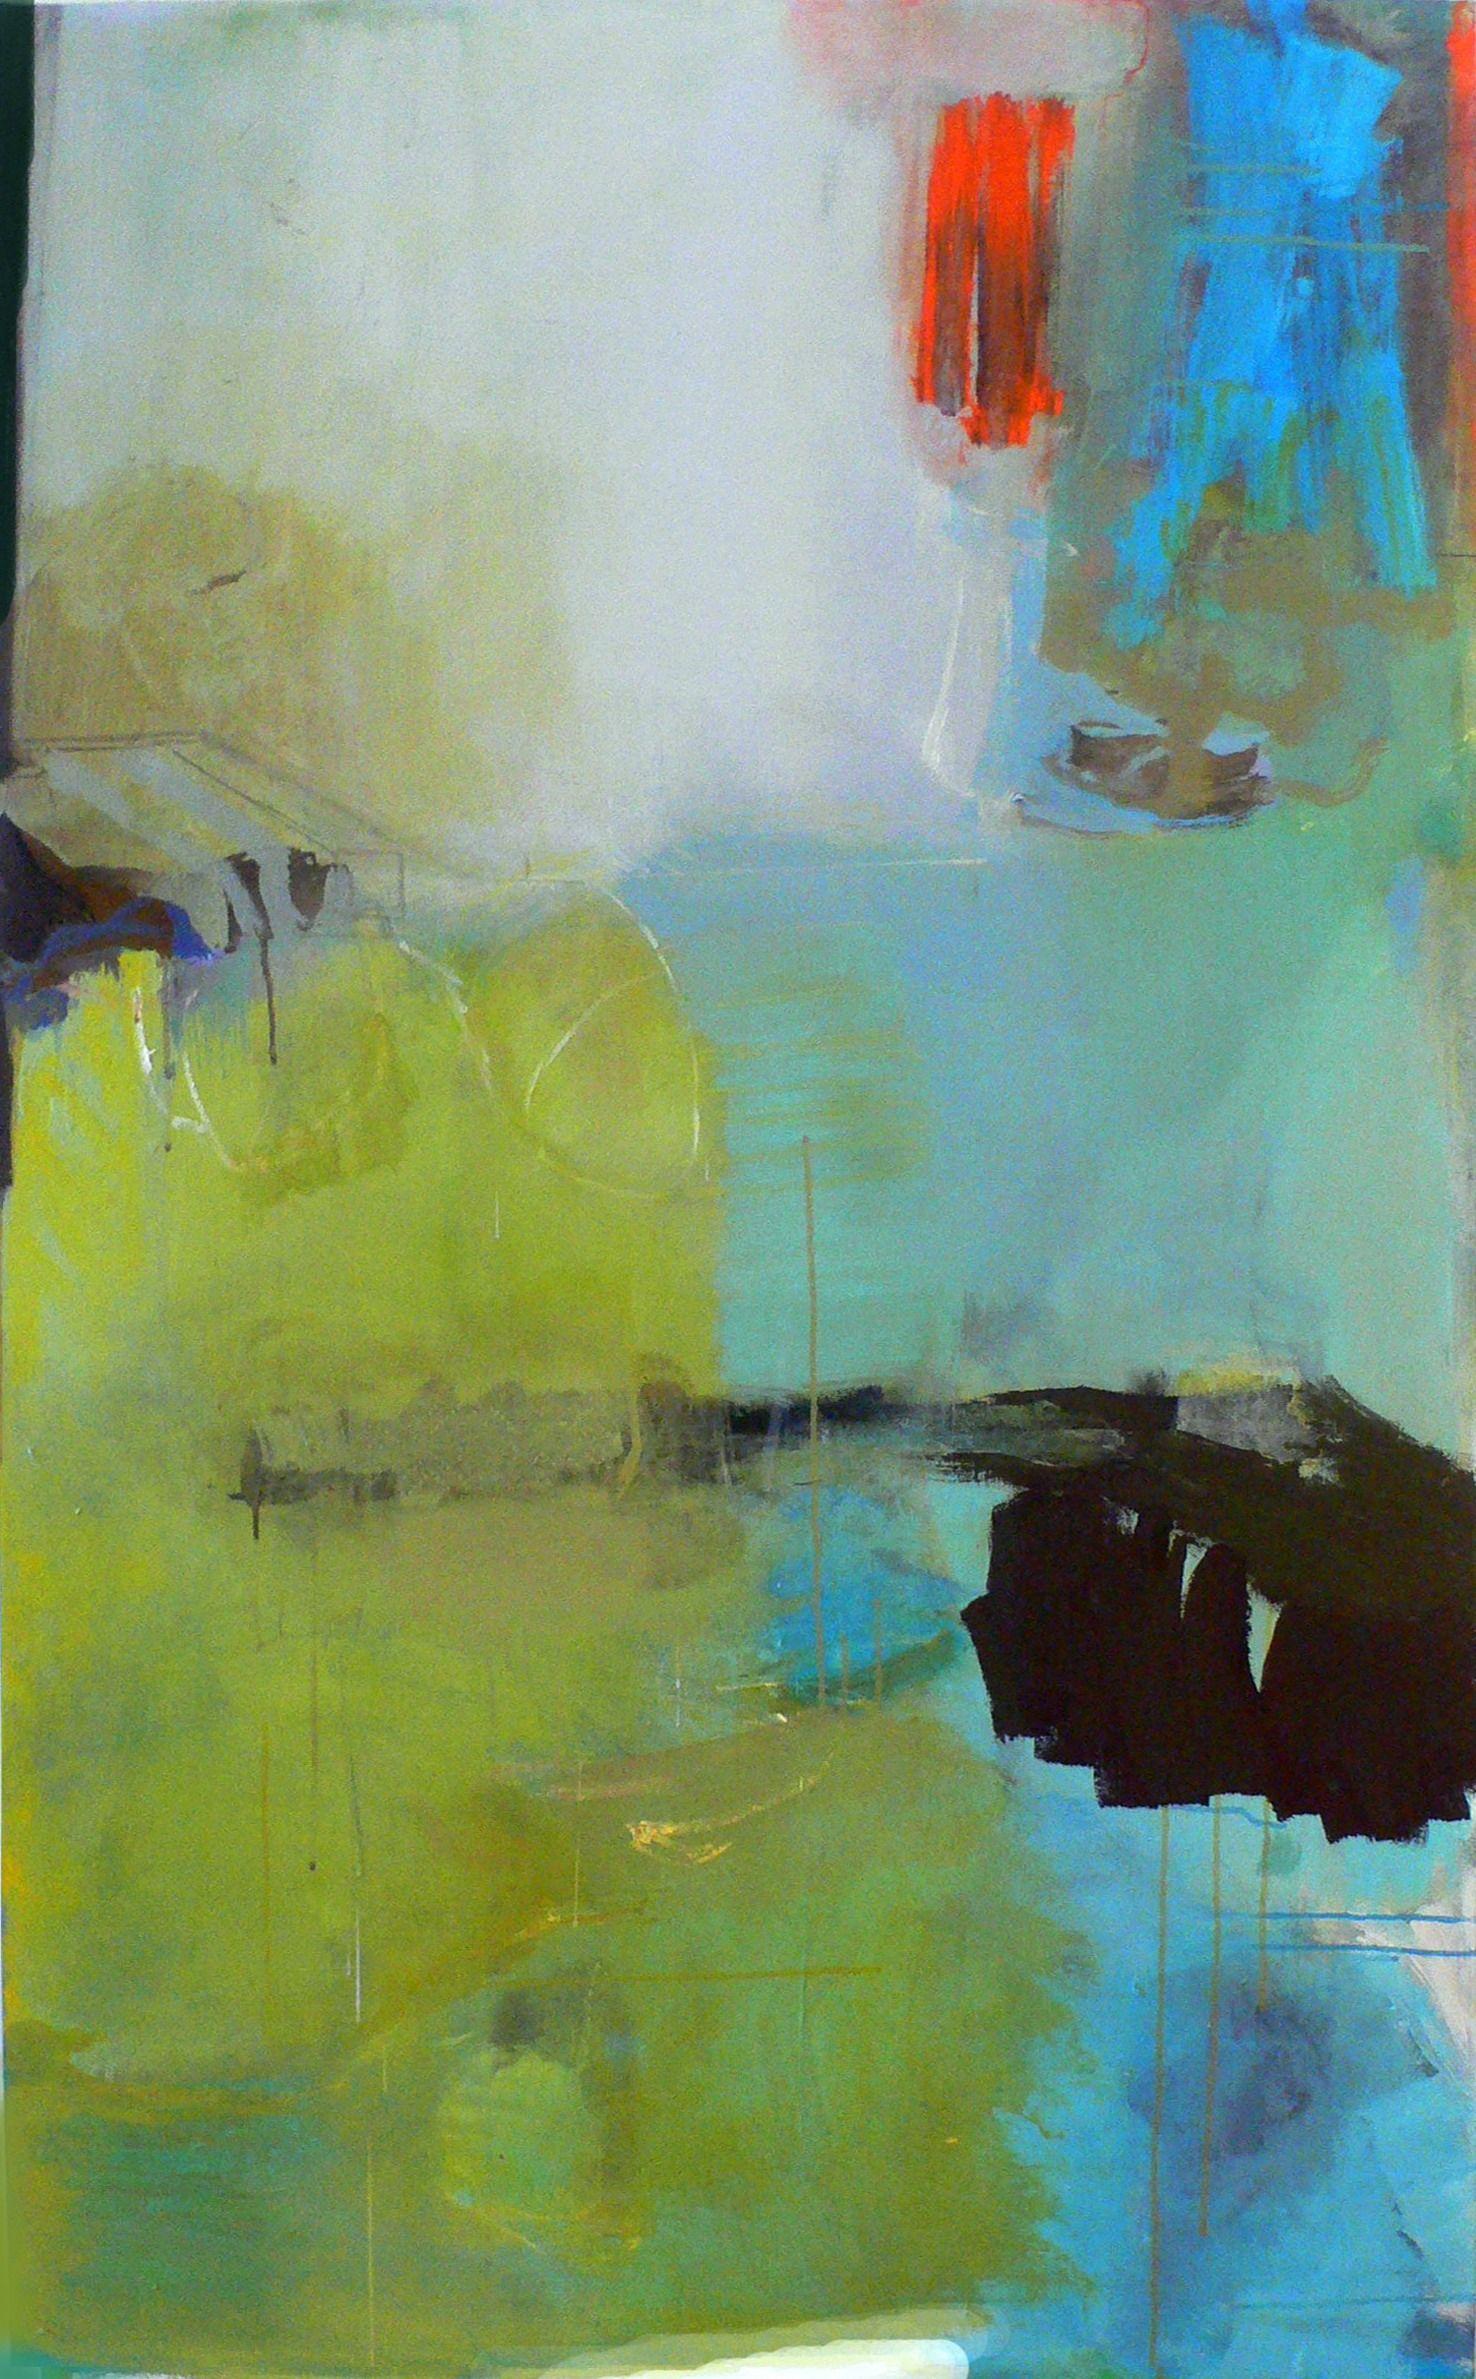 Madeline Denaro In 2021 Abstract Art Inspiration Abstract Art Painting Contemporary Abstract Art